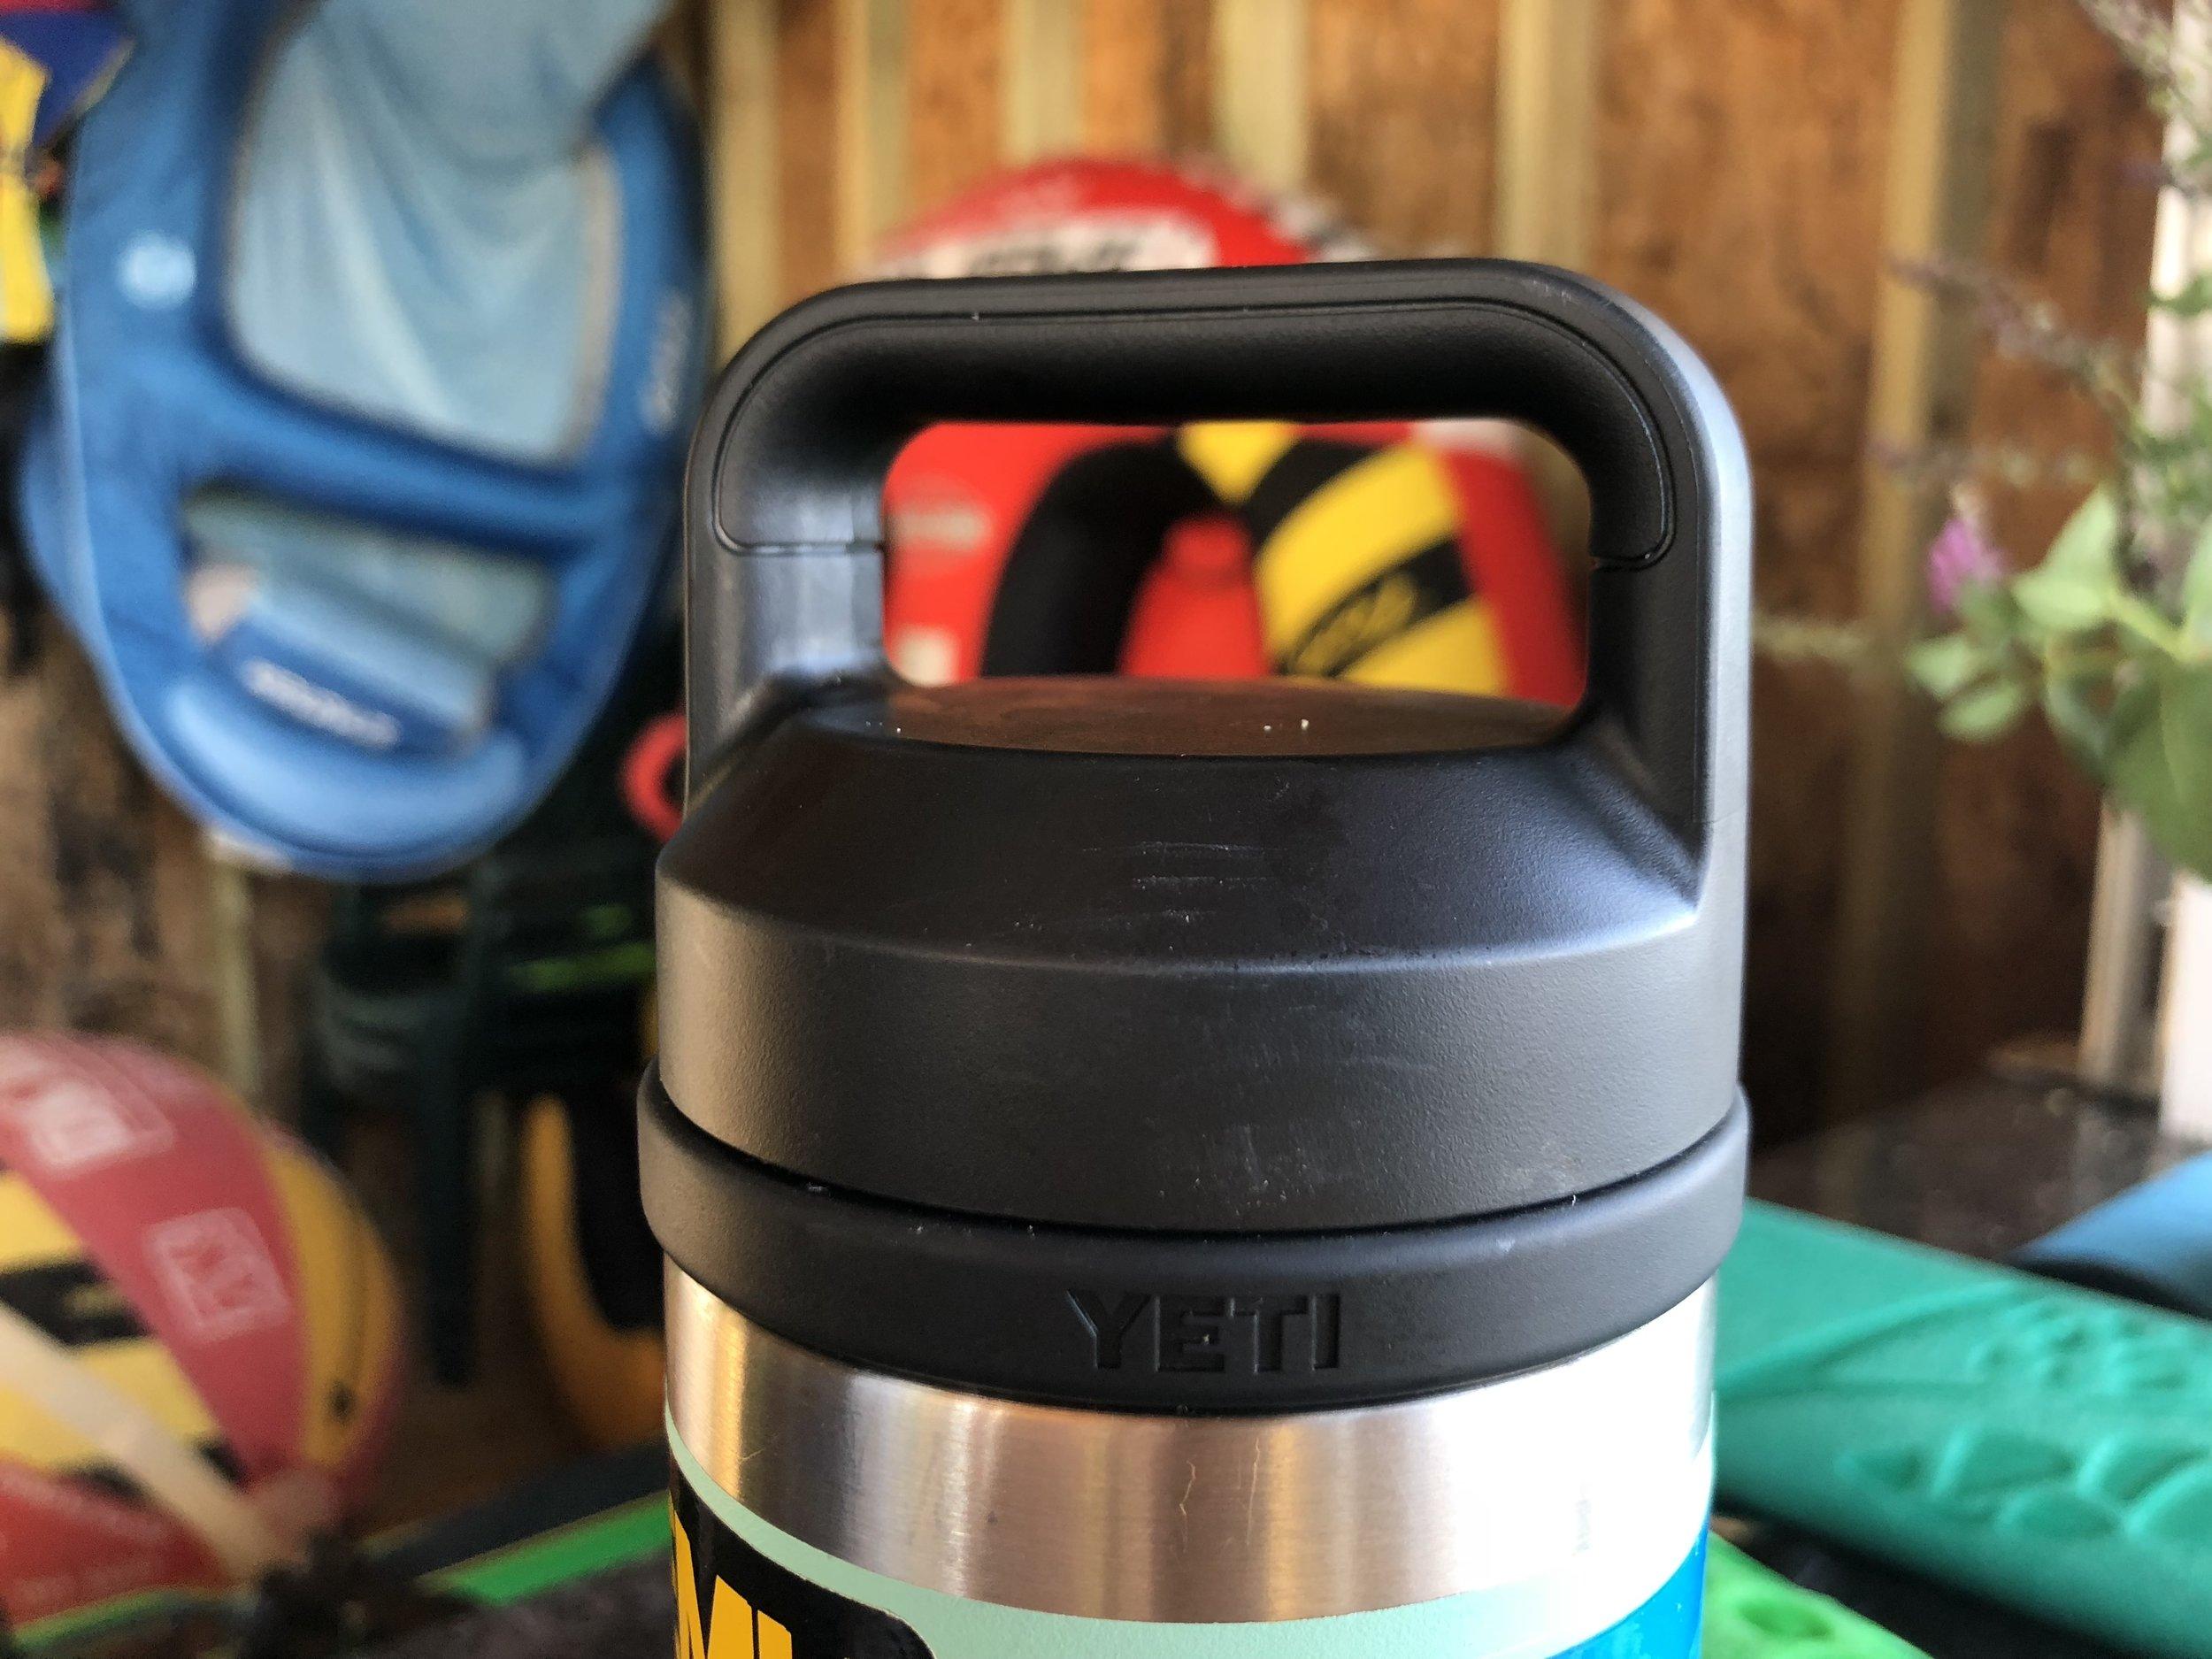 YETI Rambler Bottle Chug Cap: For Those In A Hurry